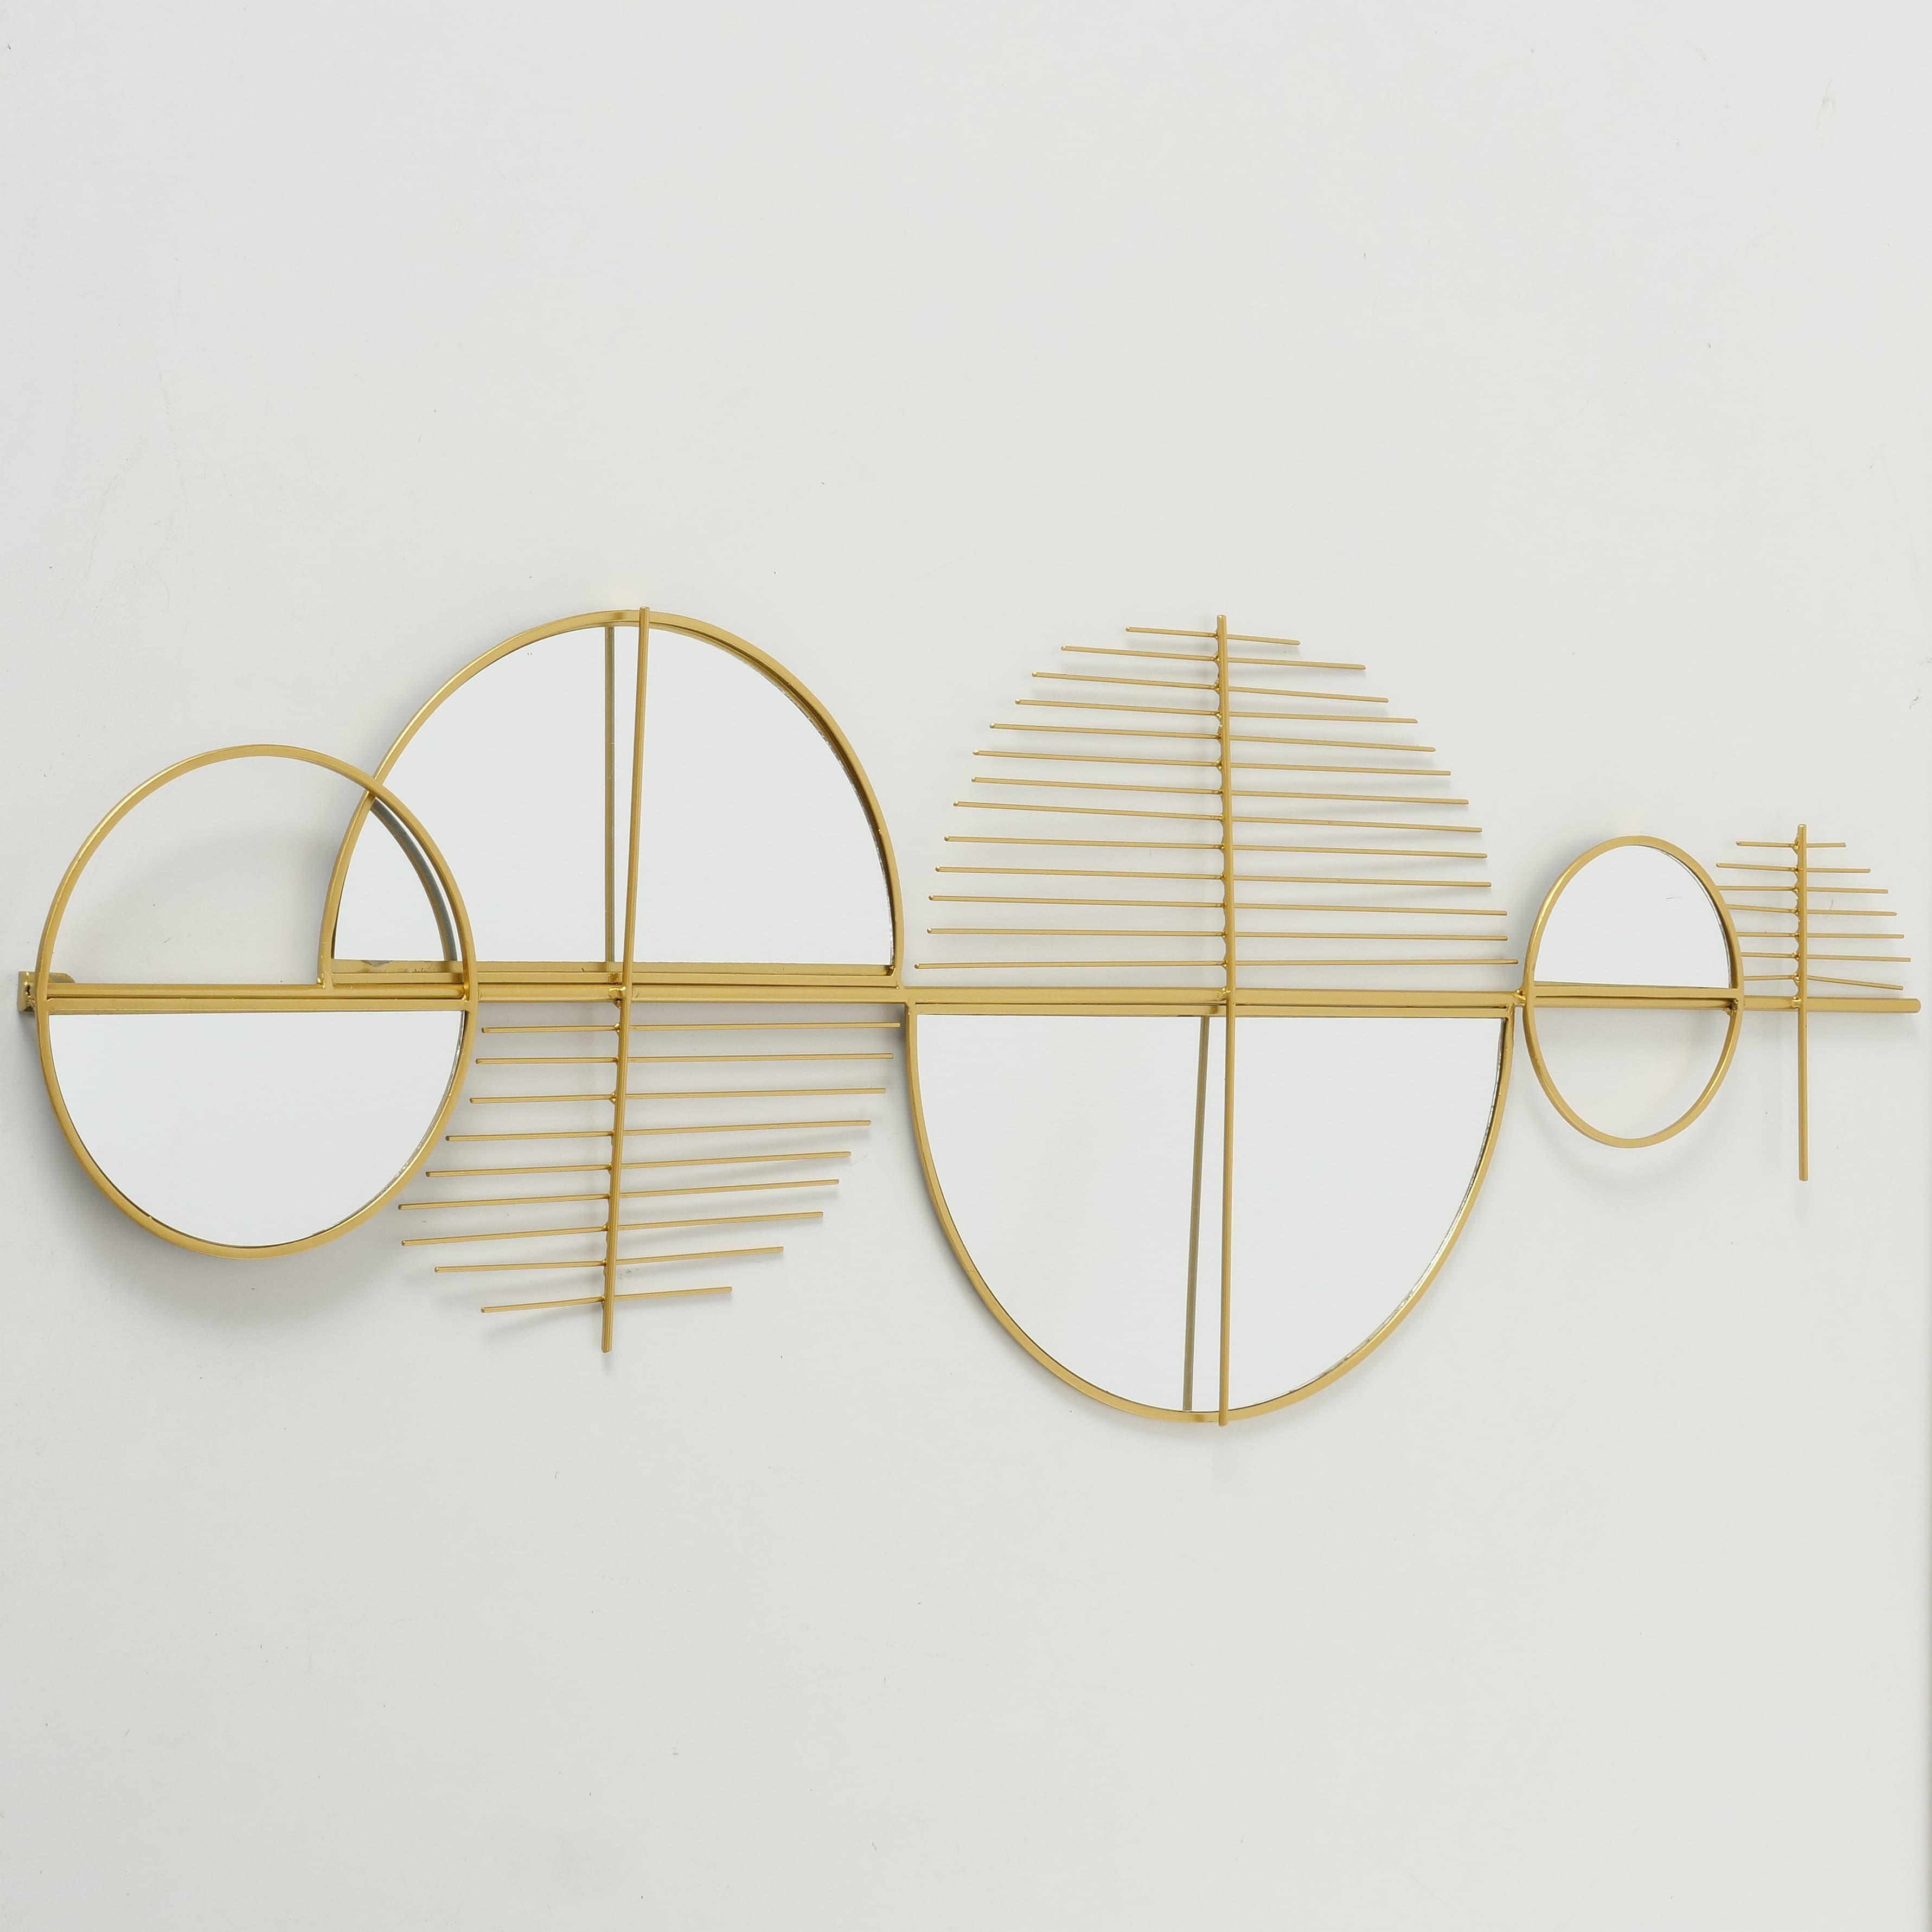 Decoratiune metalica de perete Gogolo Auriu, l114xA3xH39 cm poza